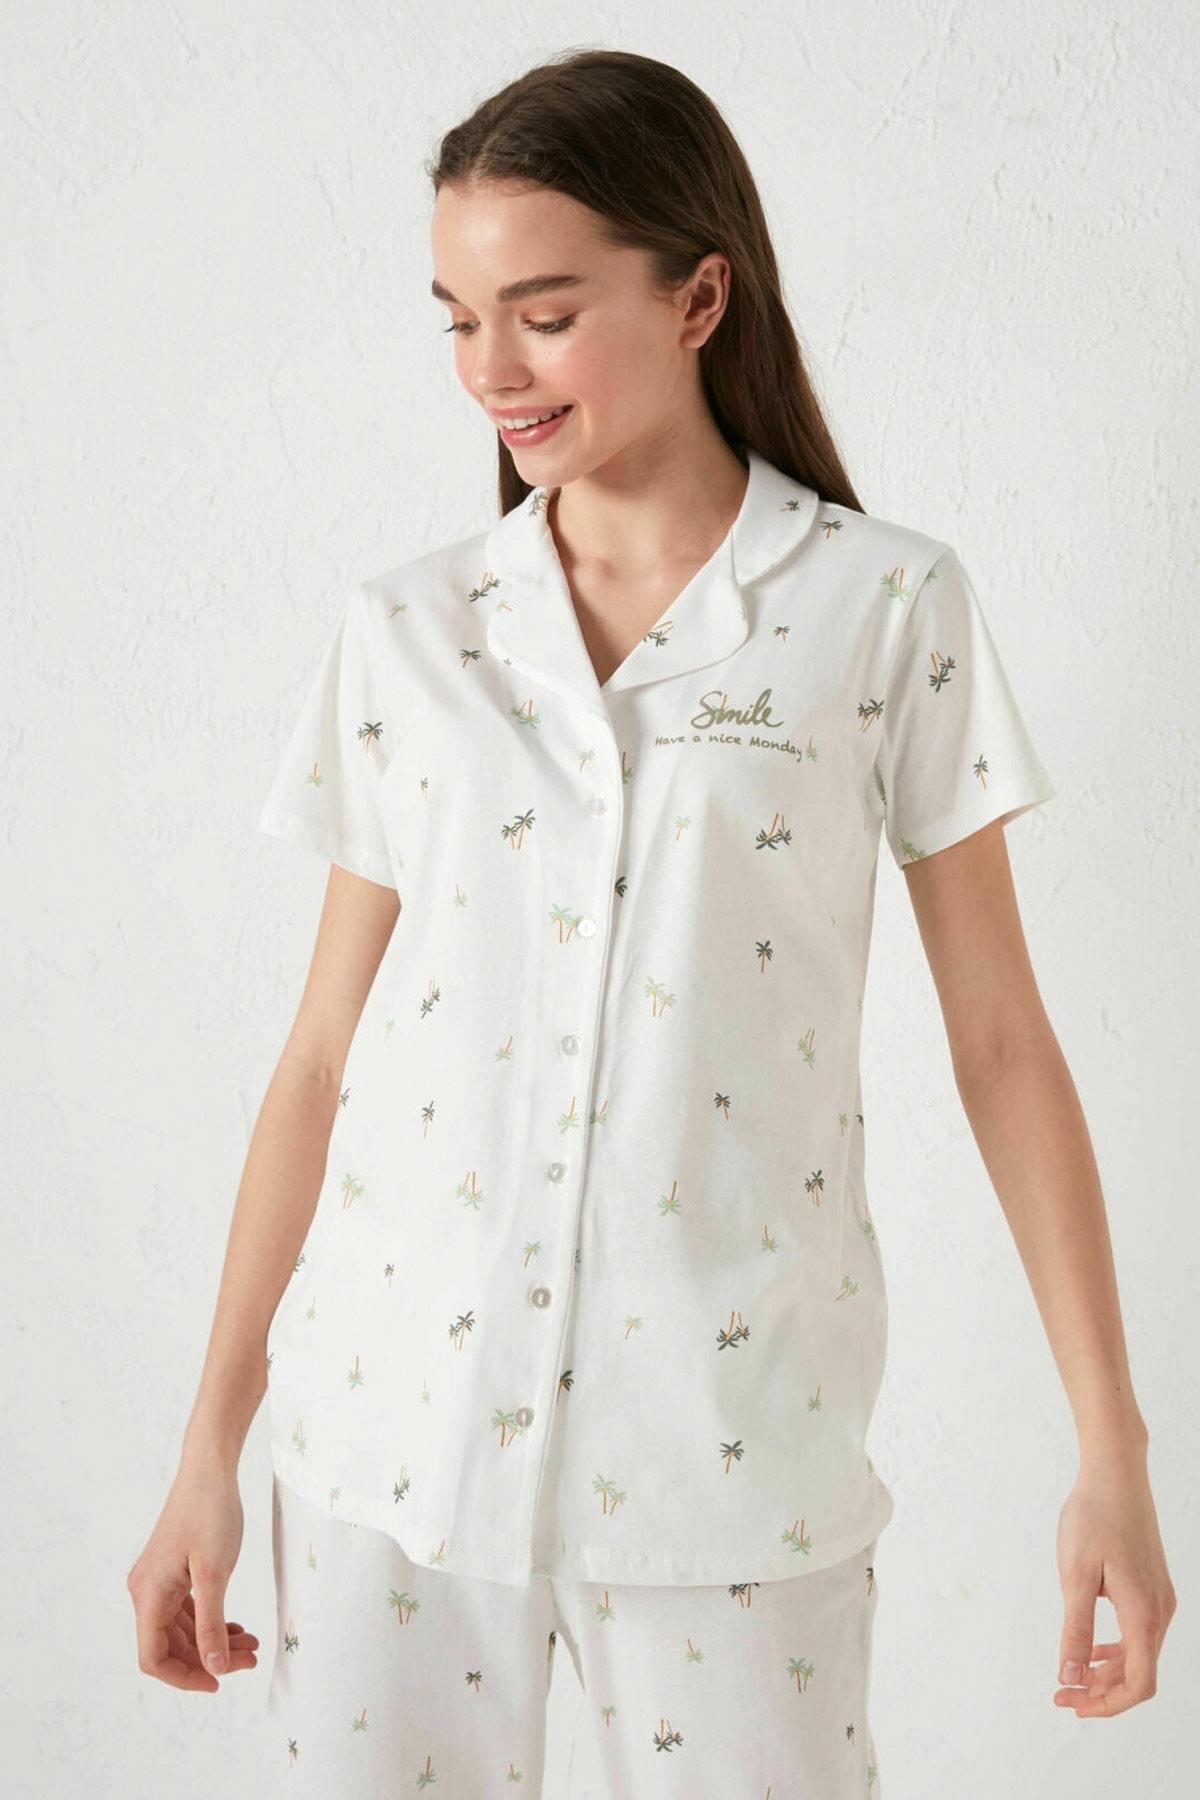 LC Waikiki Kadın Ekru Baskılı LCW DREAM Pijama Takım 1